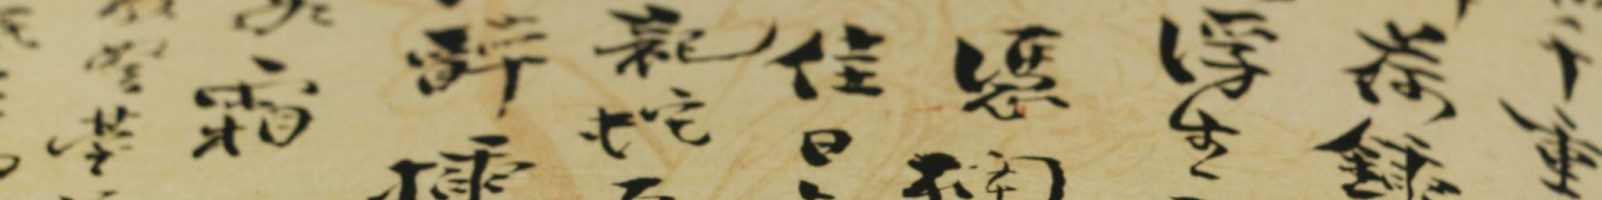 Péndulo I Ching a distancia